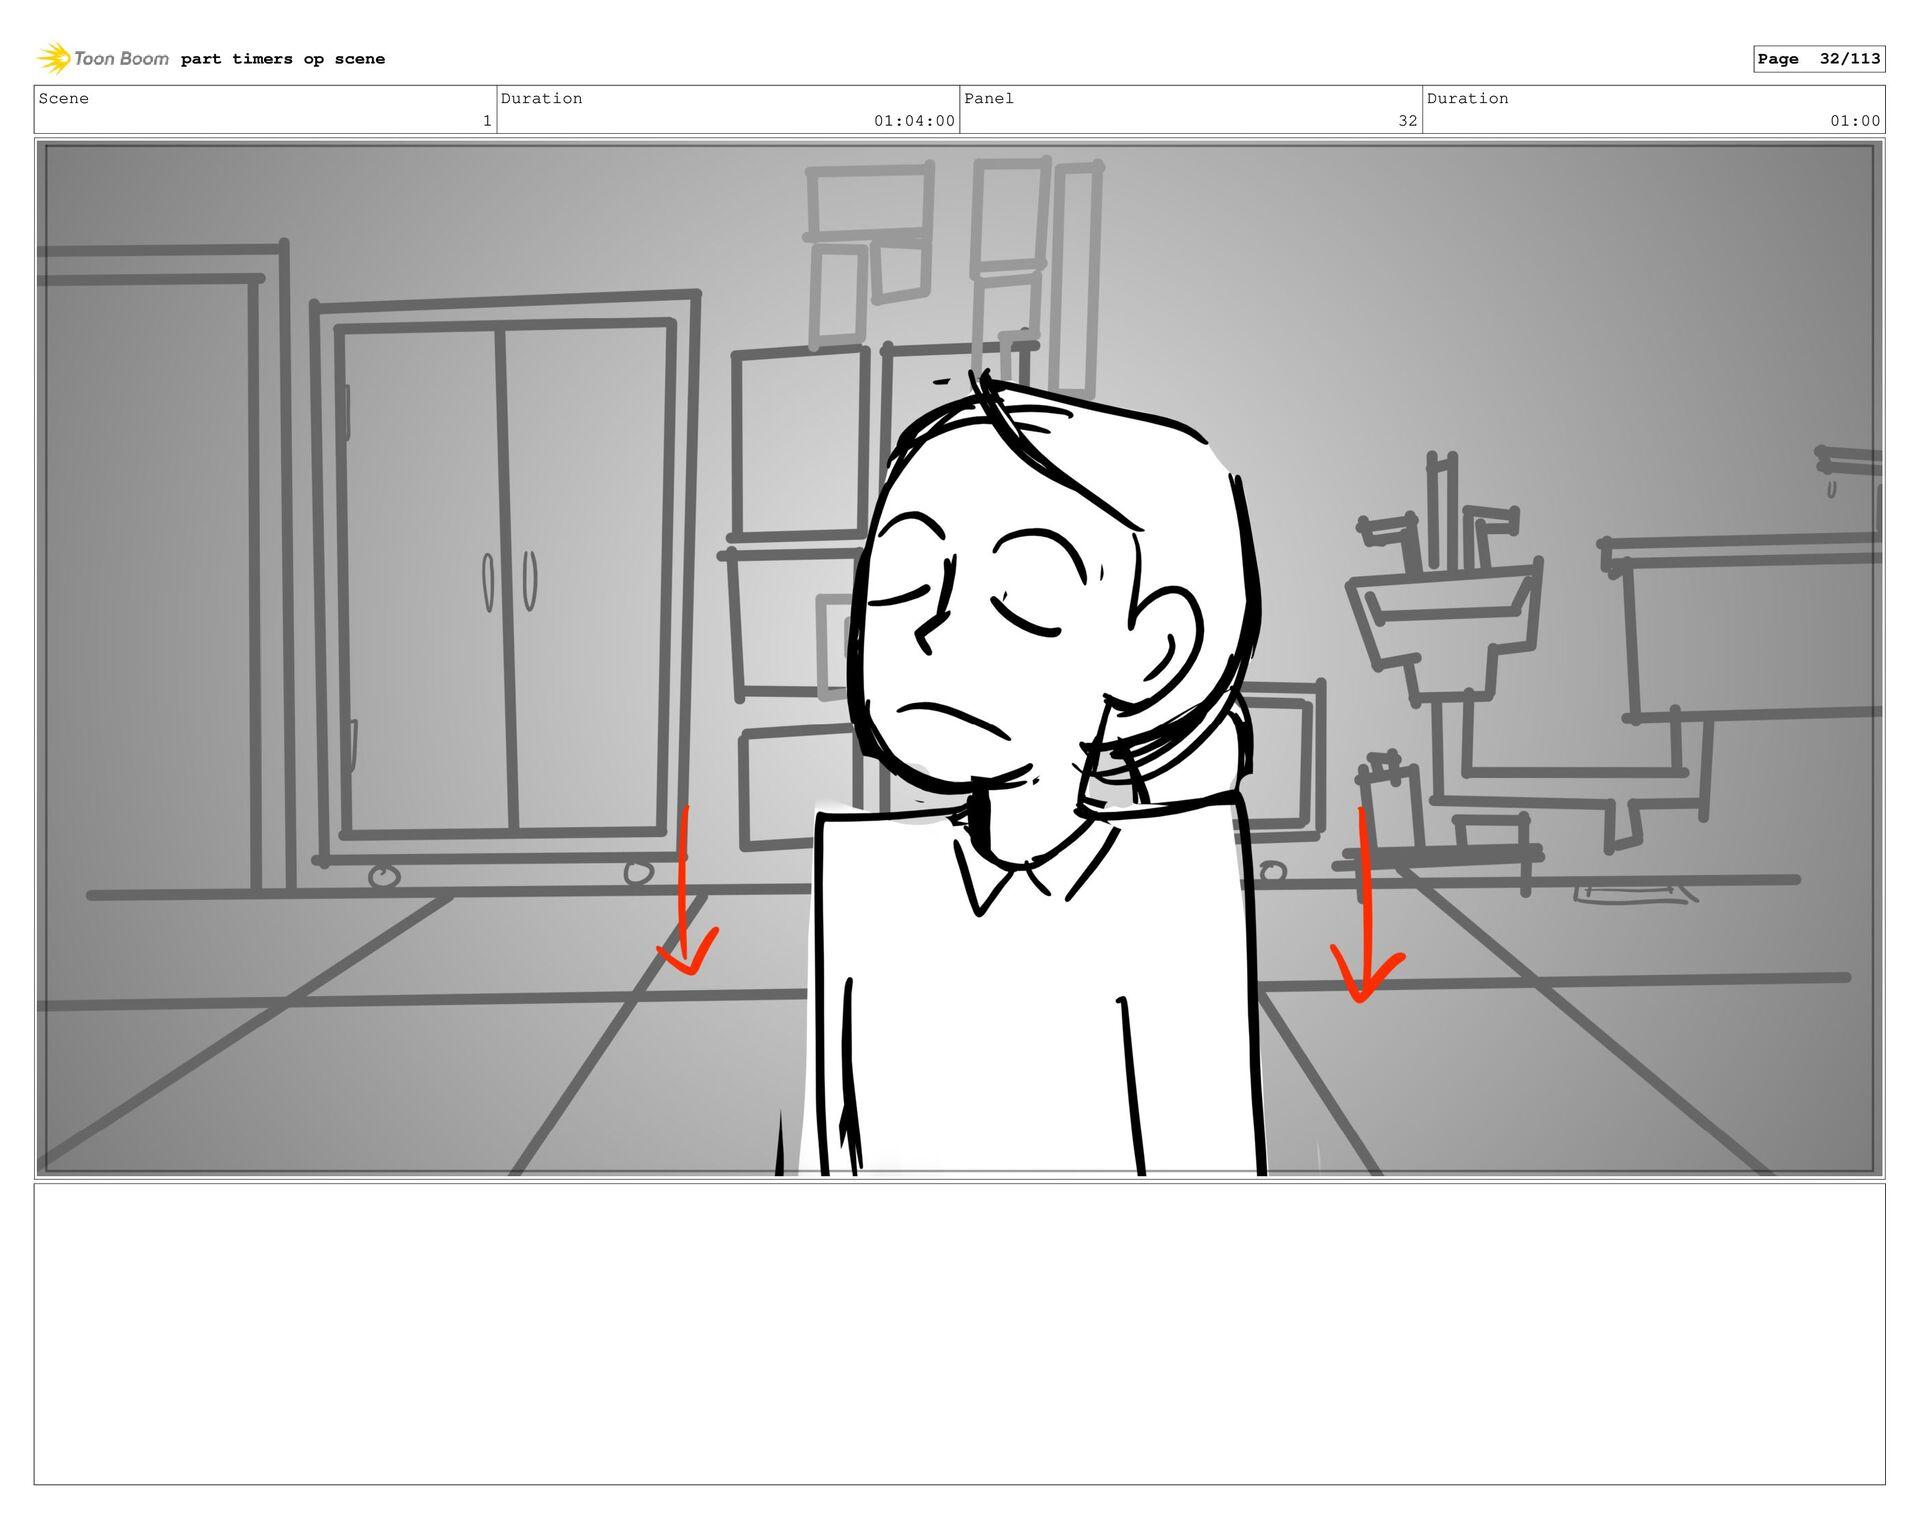 Scene 2 Duration 05:00 Panel 5 Duration 01:00 p...